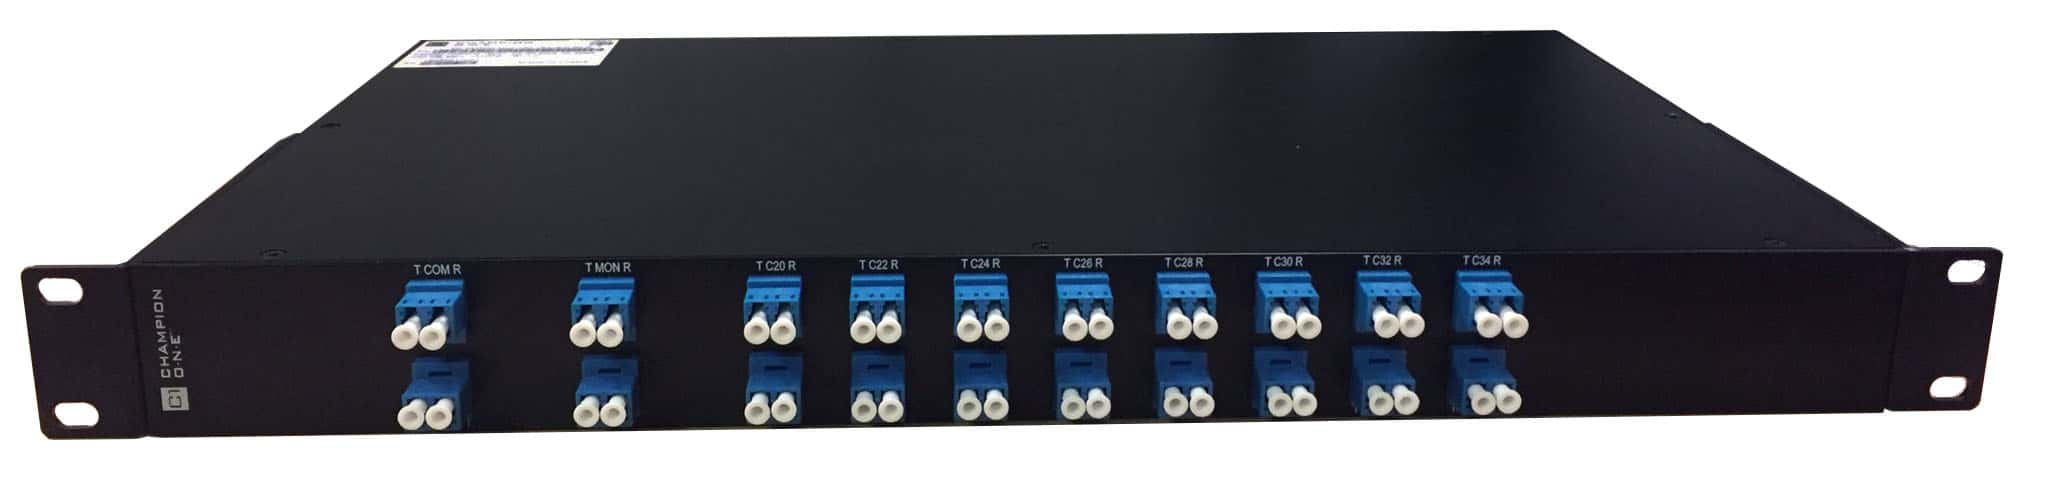 16 Channel DWDM Mux/Demux, ch. 21 start, in 1RU Enclosure